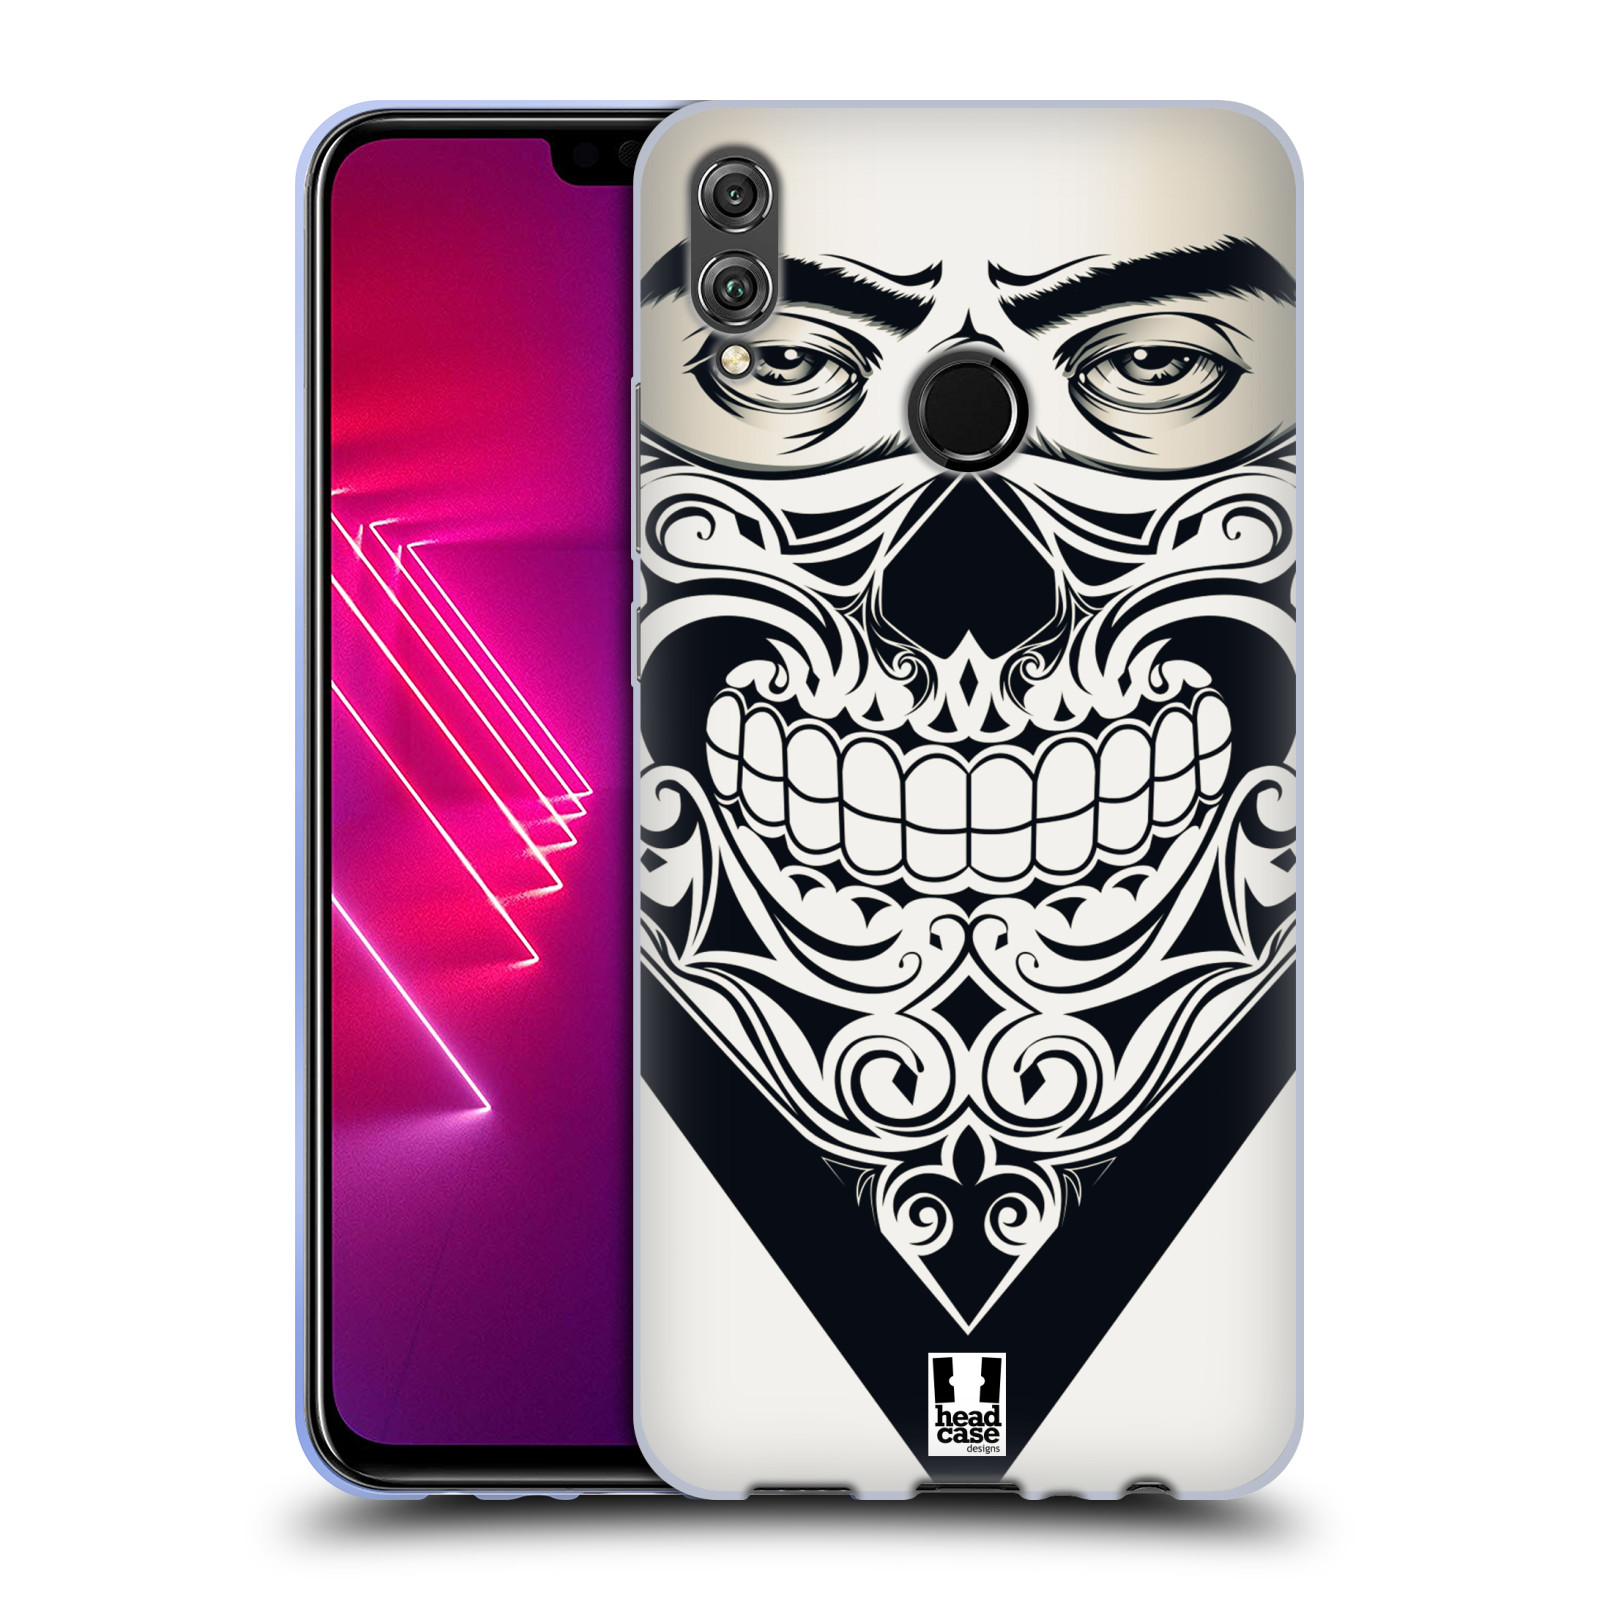 Silikonové pouzdro na mobil Honor View 10 Lite - Head Case - LEBKA BANDANA